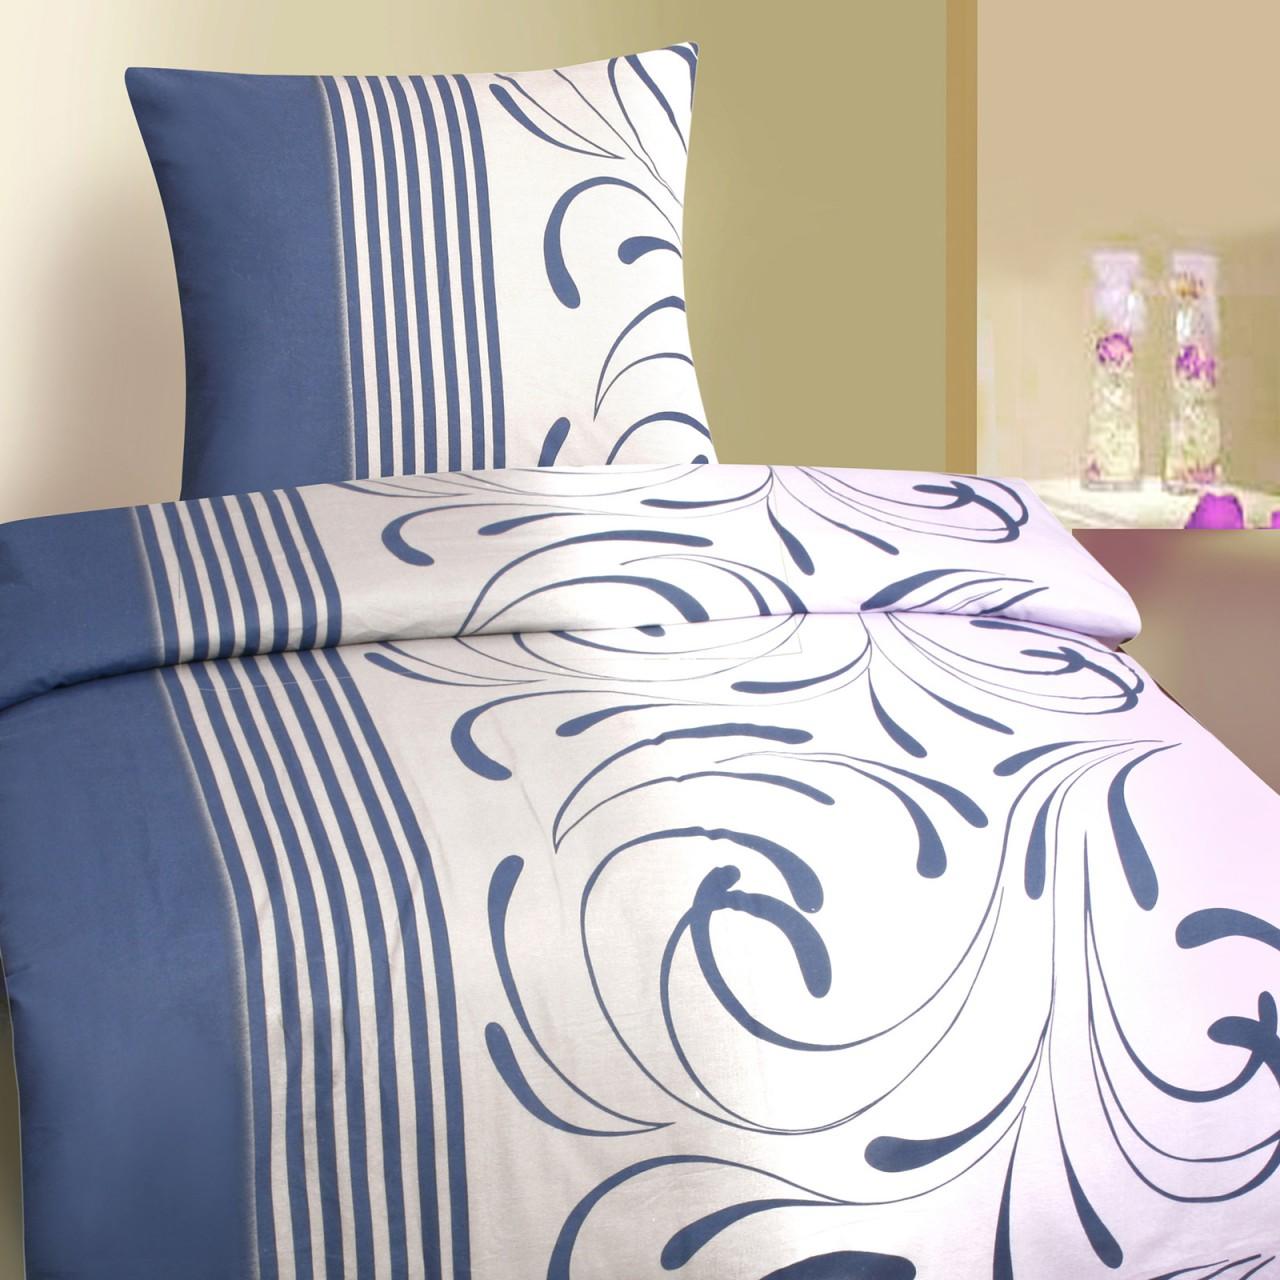 premium qualit ts biber bettw sche 135x200 cm in 4 designs. Black Bedroom Furniture Sets. Home Design Ideas